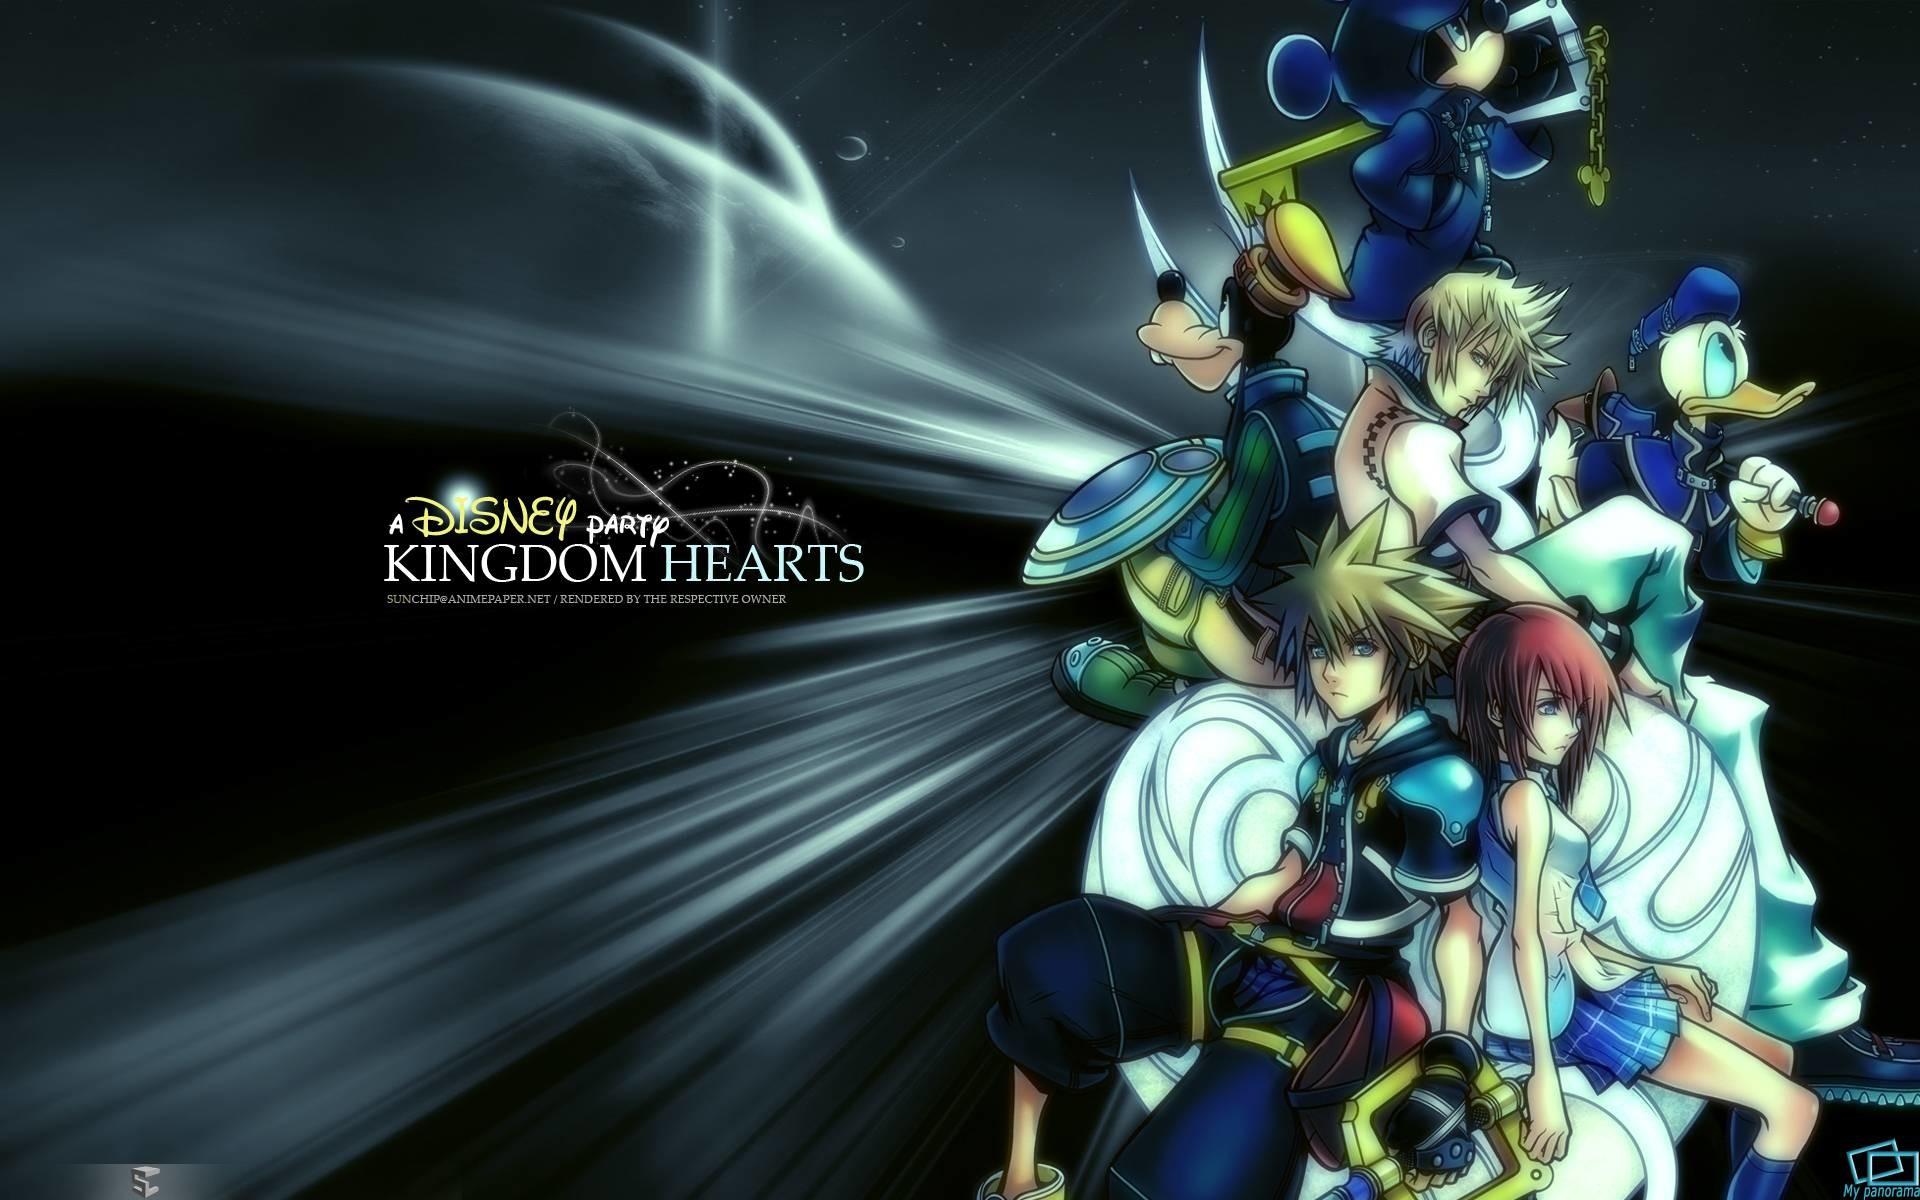 1920x1200 Kingdom Hearts 2 Wallpapers